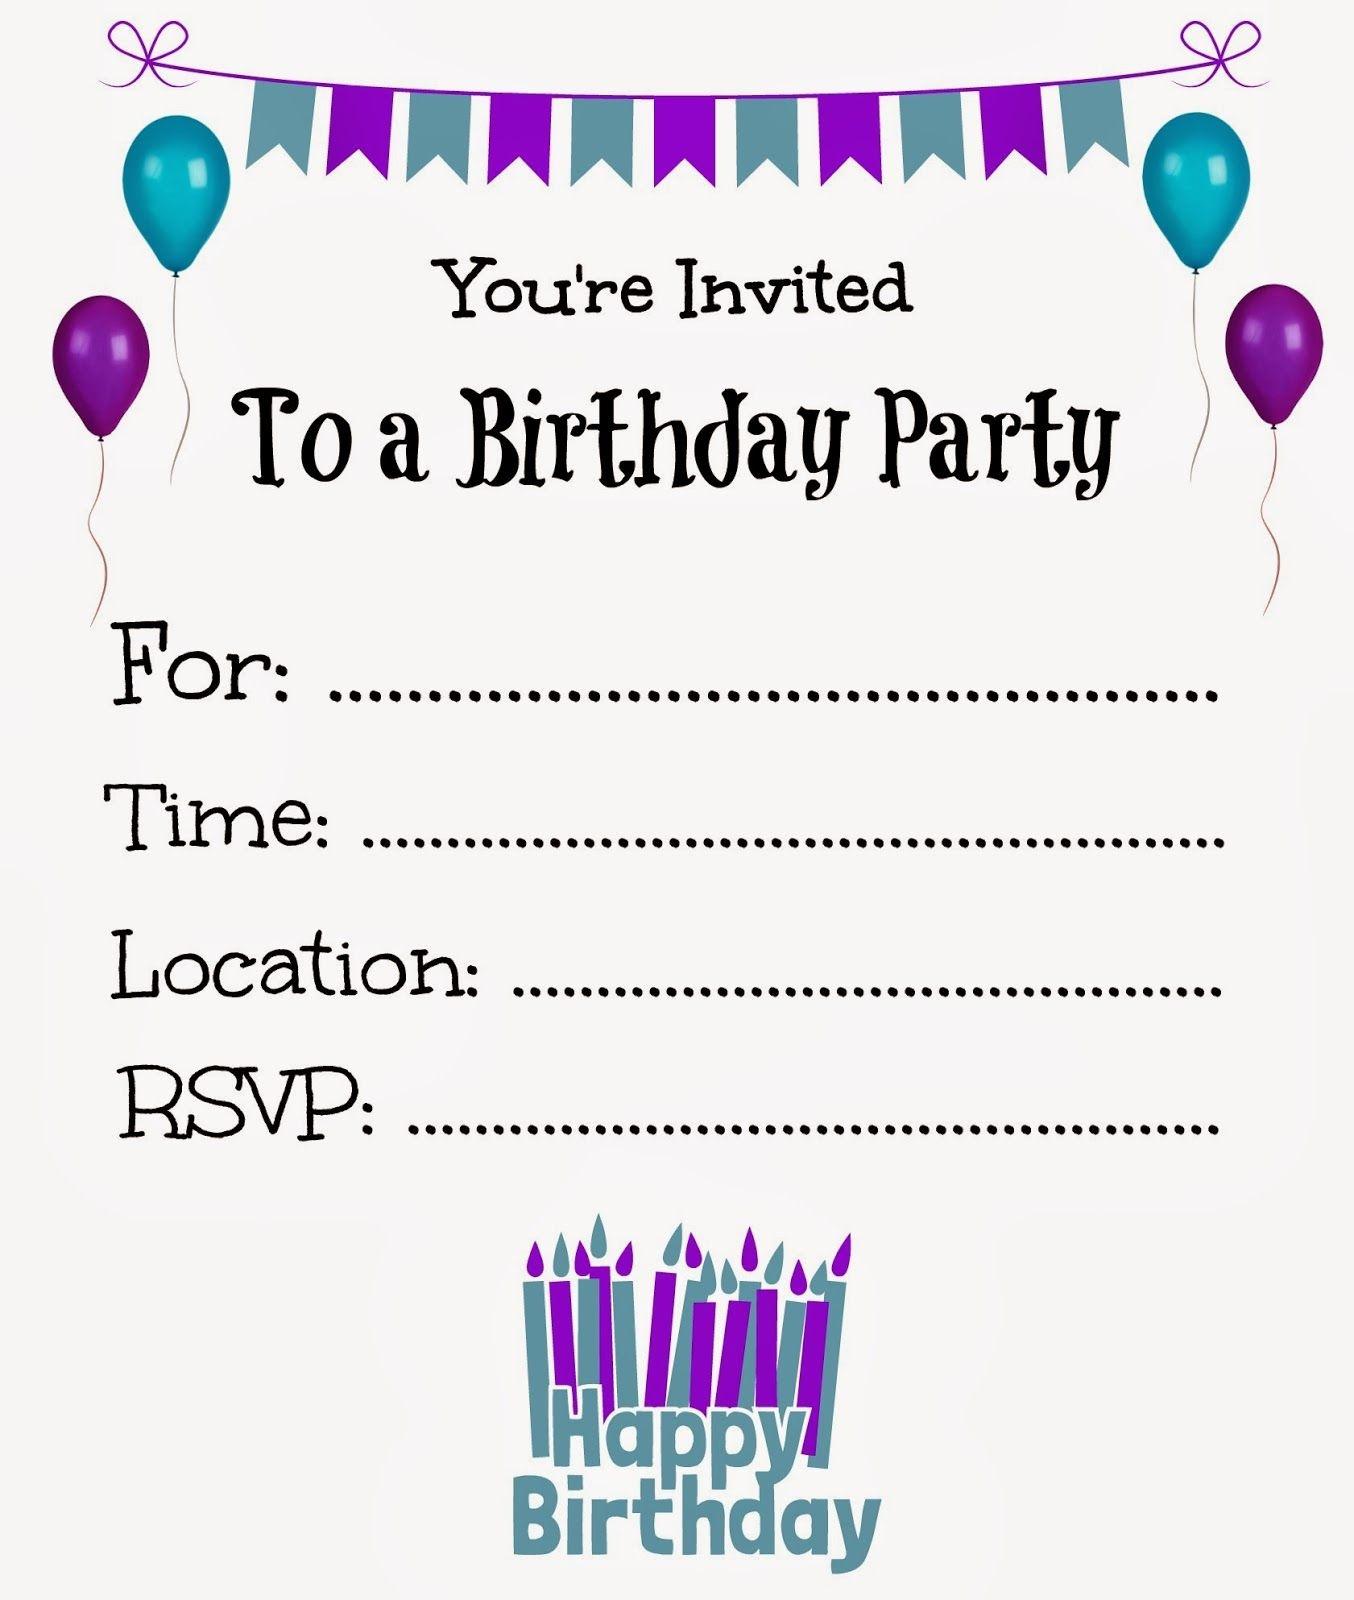 Free Printable Birthday Invitations For Kids #freeprintables - Happy Birthday Invitations Free Printable